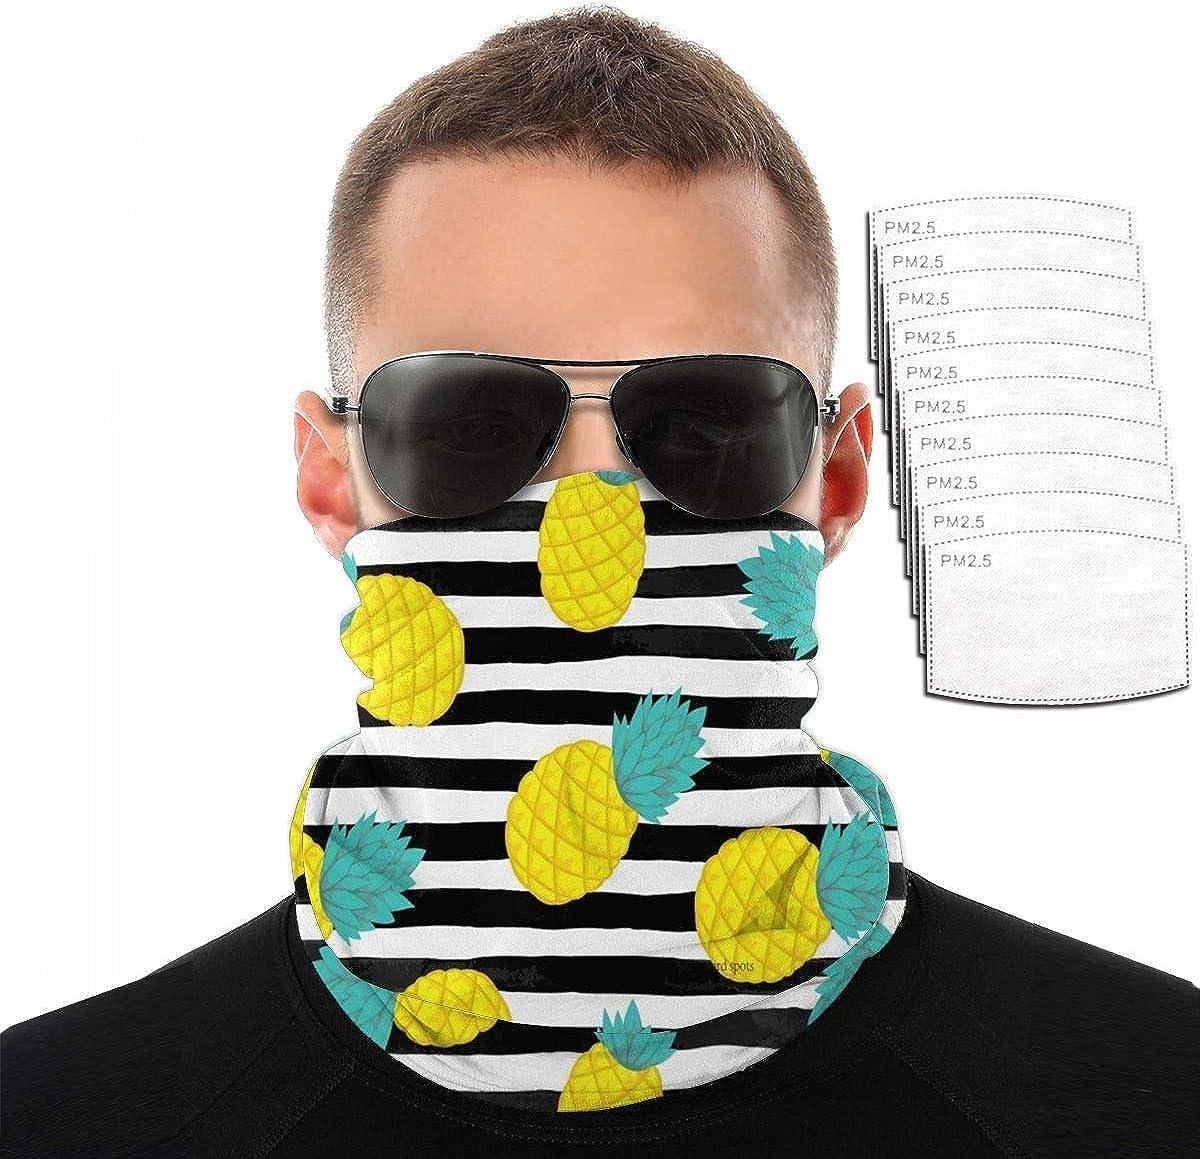 KiuLoam Bandana Face Mask Reusable,Pineapple Stripes Neck Gaiter Balaclava for Women Men